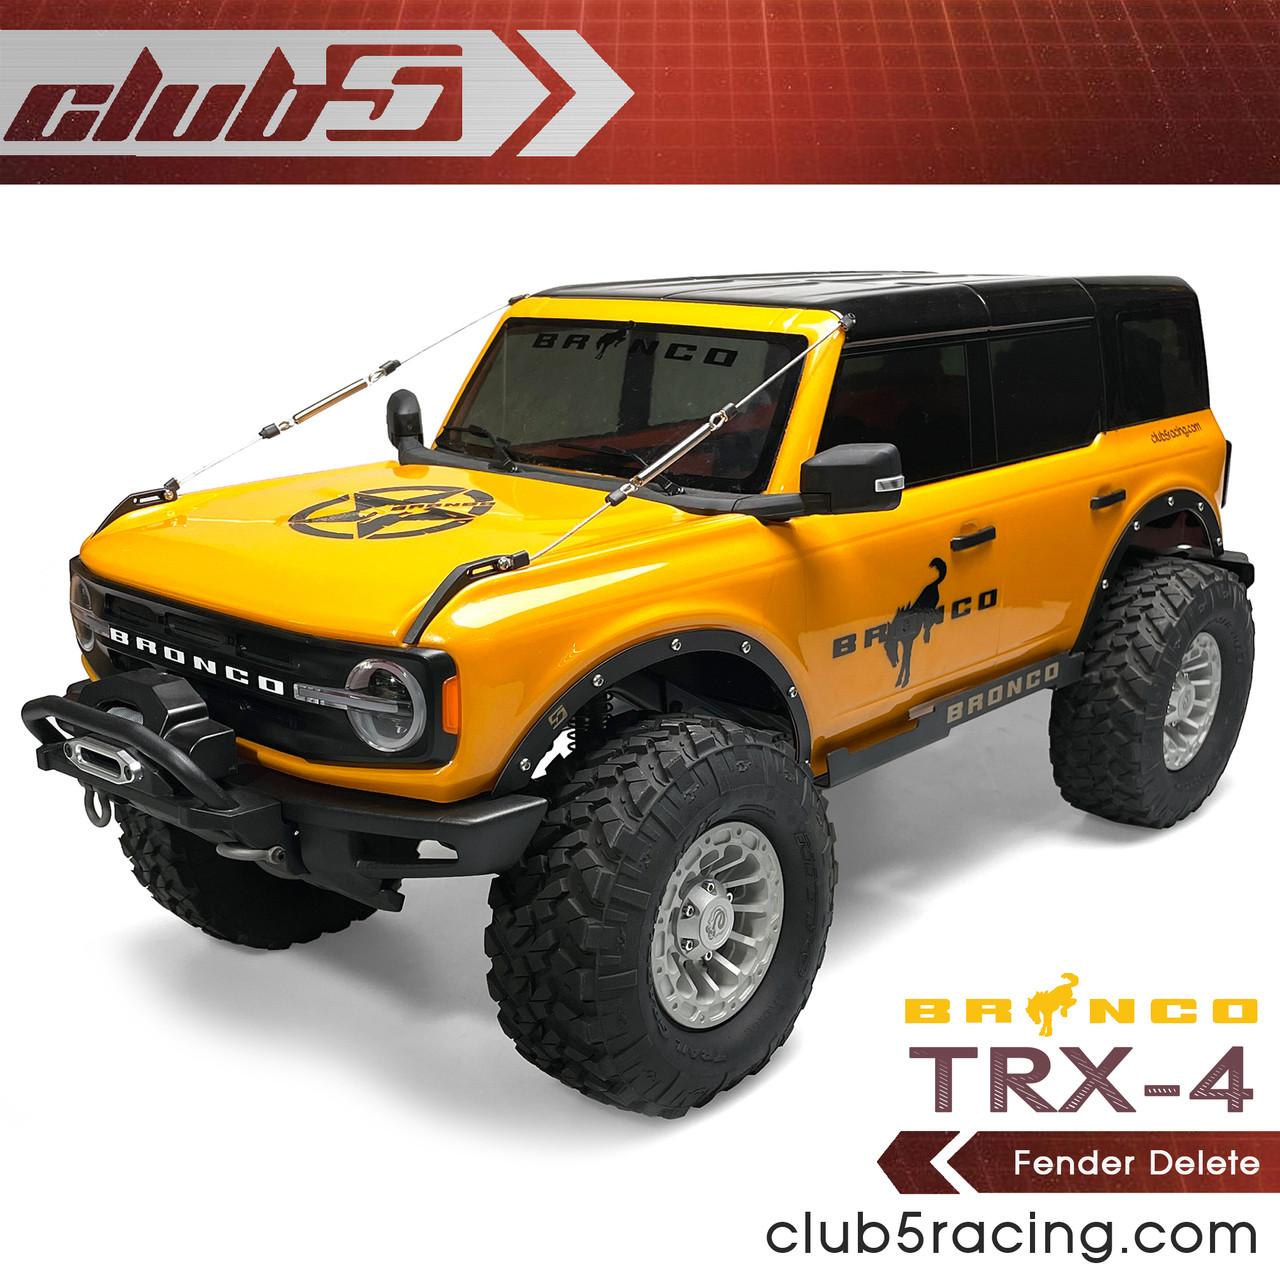 Fender Delete for Traxxas TRX-4 2021 Ford Bronco ( Black Powder Coated Steel)